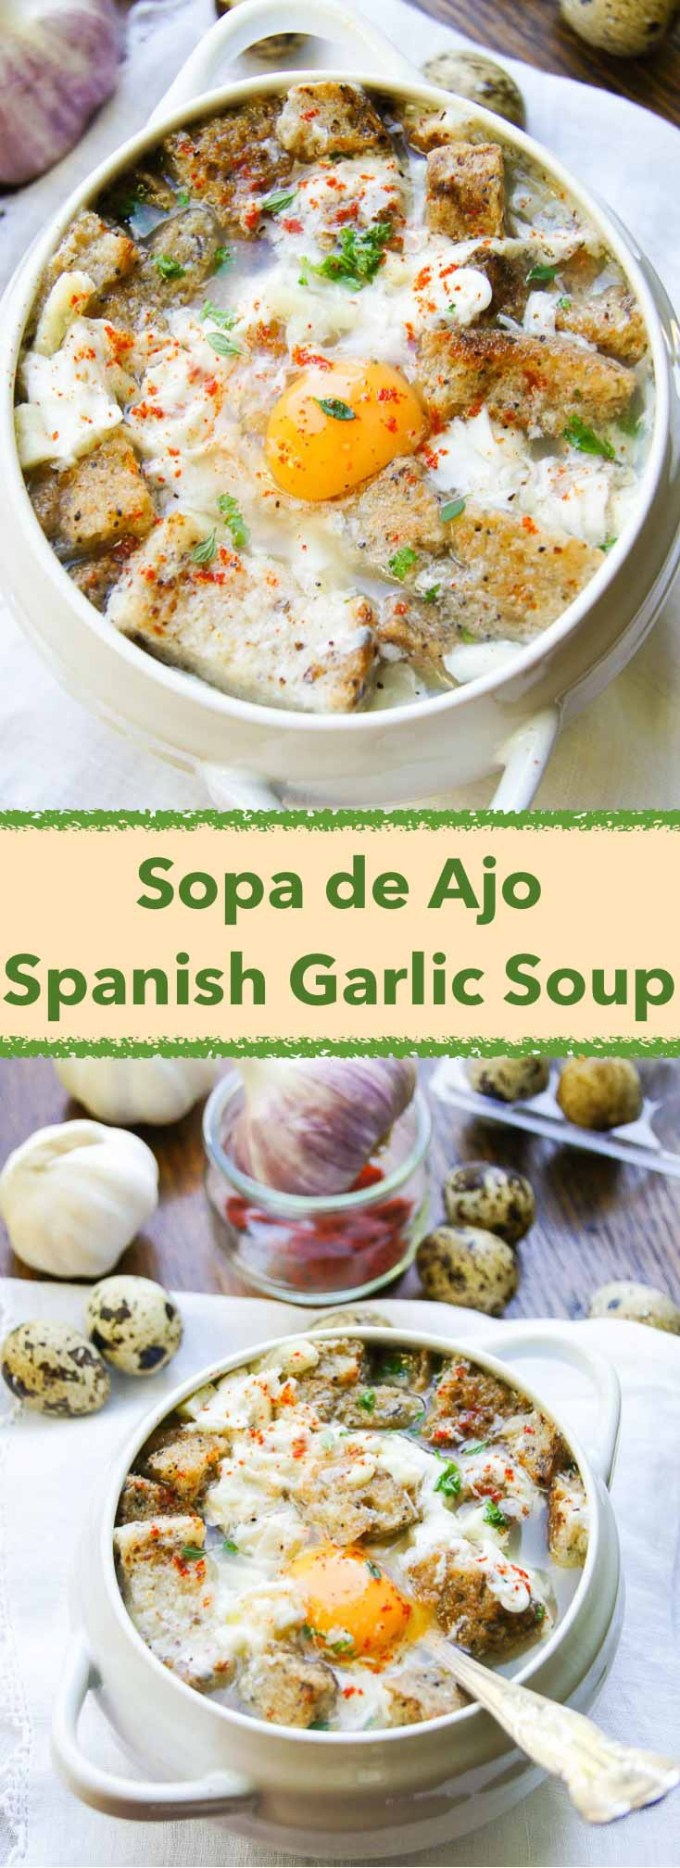 Sopa De Ajo (Garlic Soup) Recipe — Dishmaps